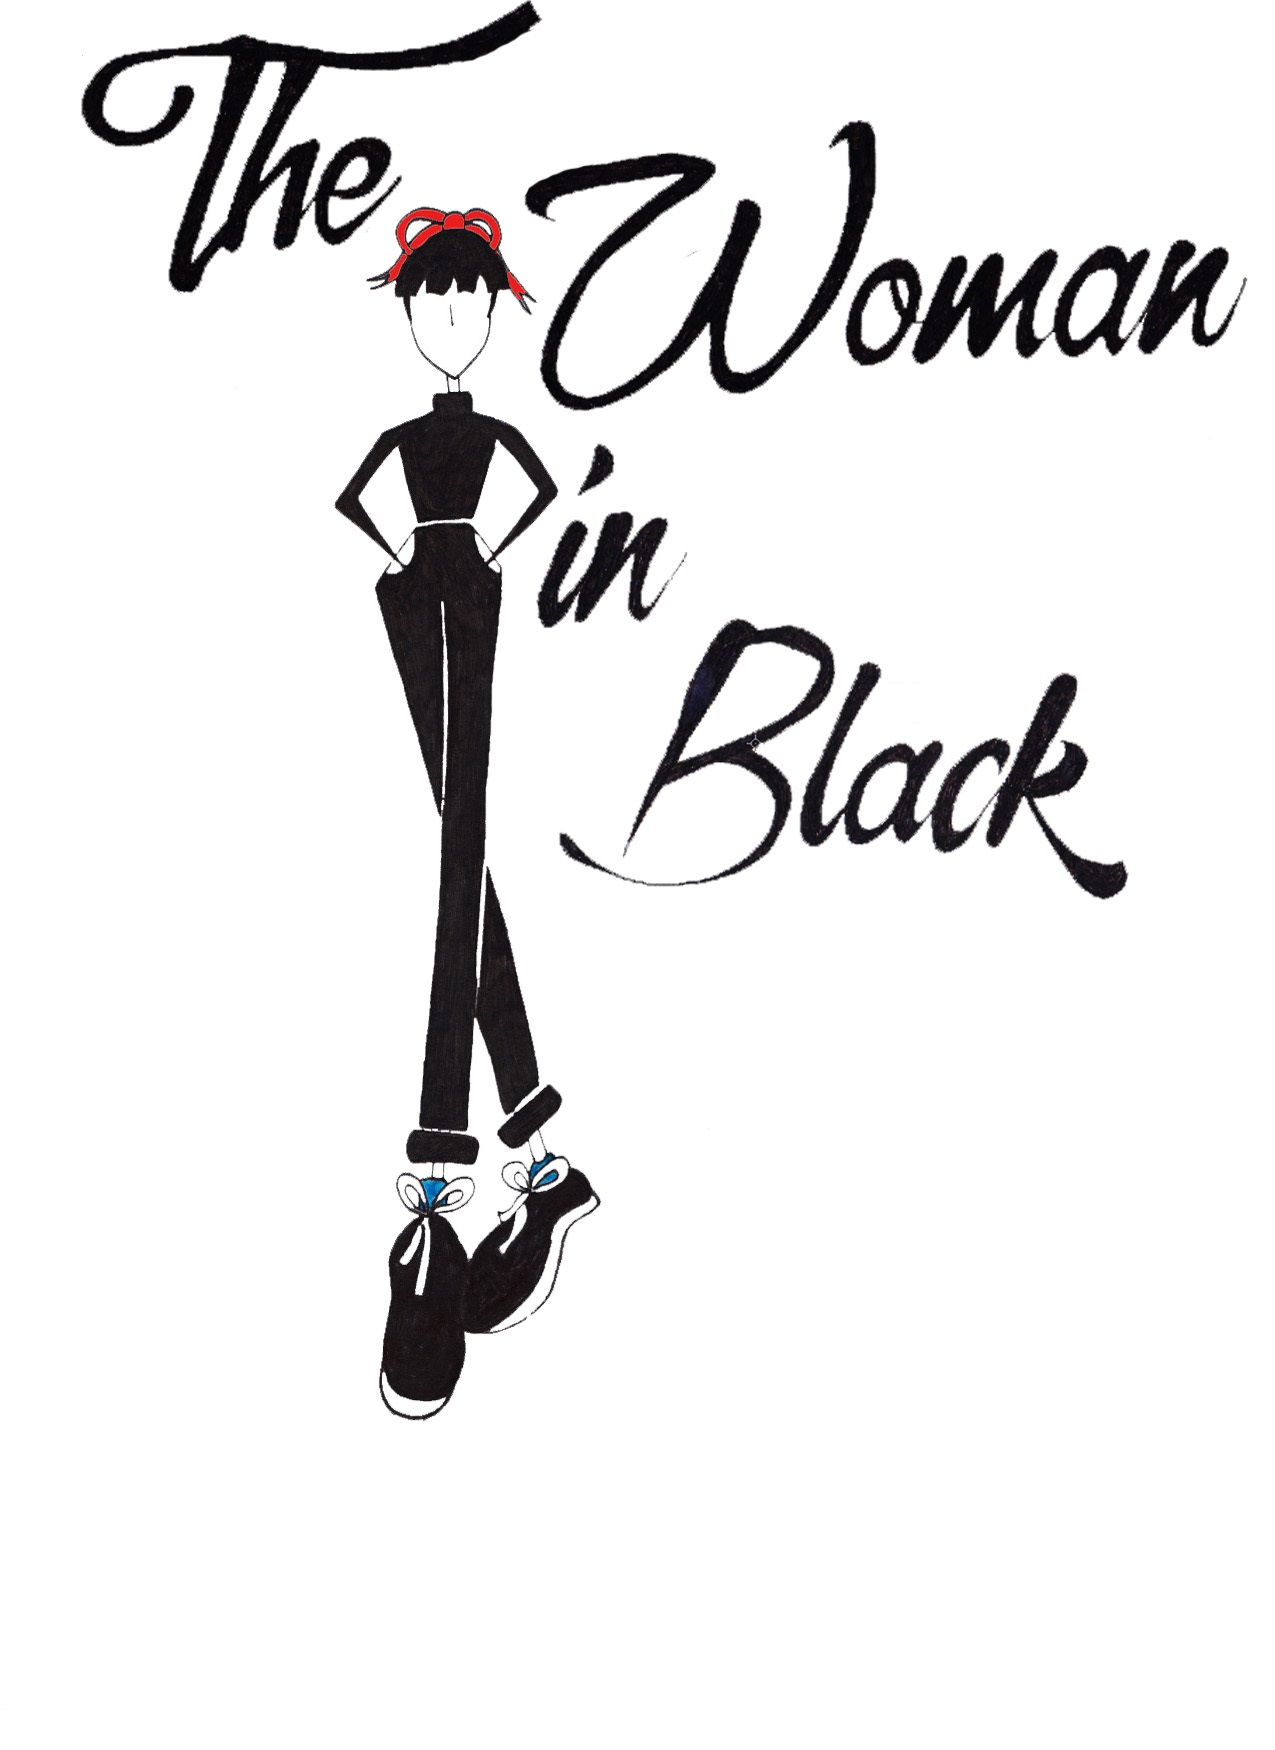 the-woman-in-balck-title-done-wordpress